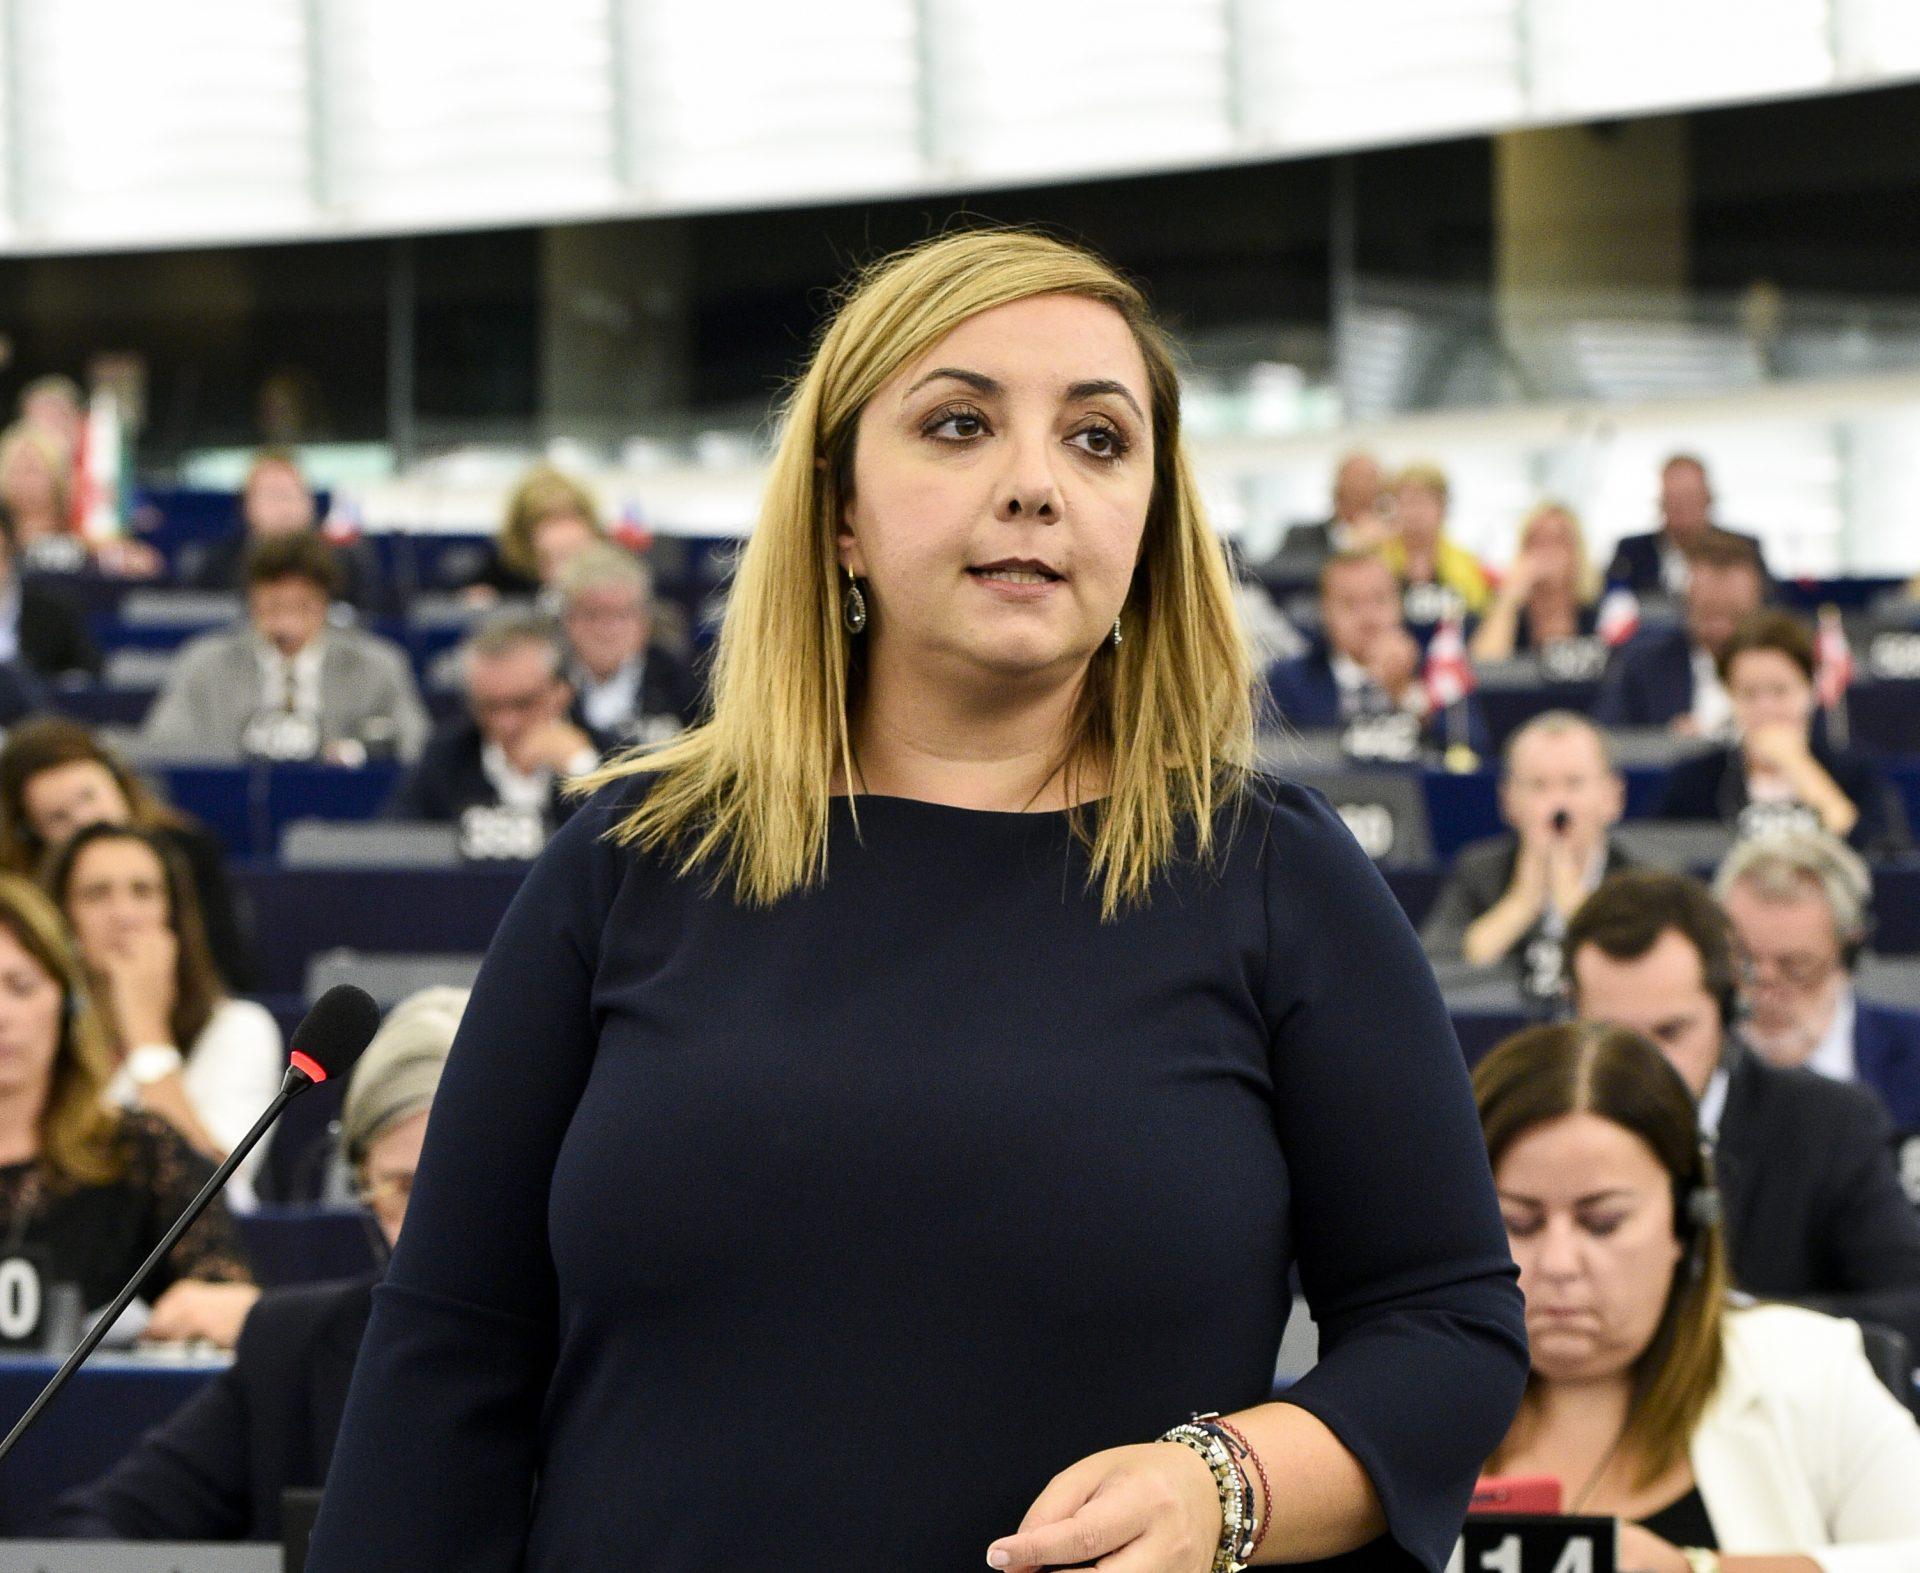 L'eurodeputata Isabella Adinolfi